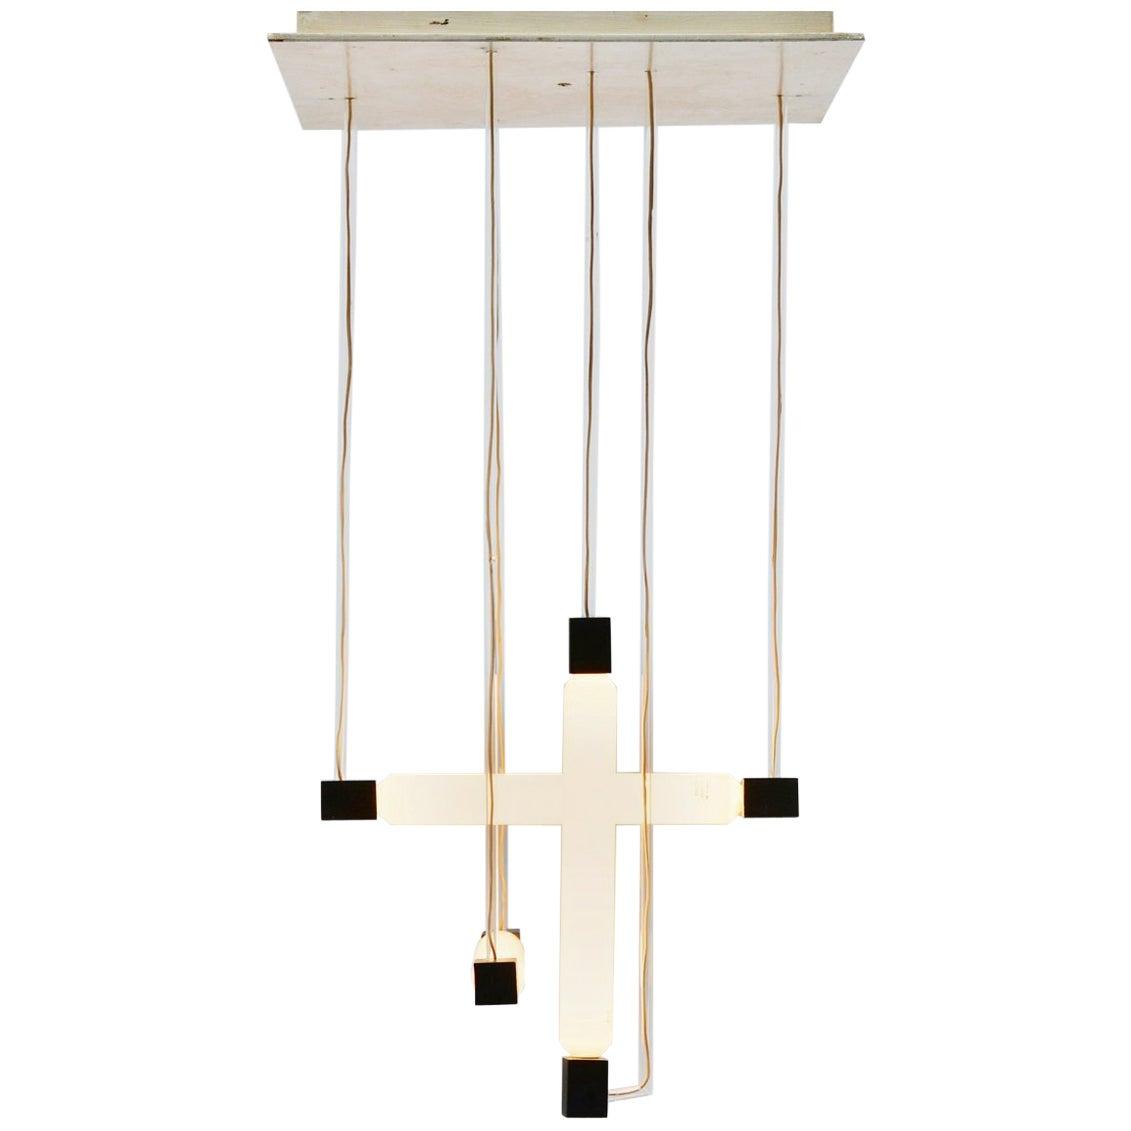 Gerrit Rietveld Buizenlamp Tubular Lamp Holland, 1950